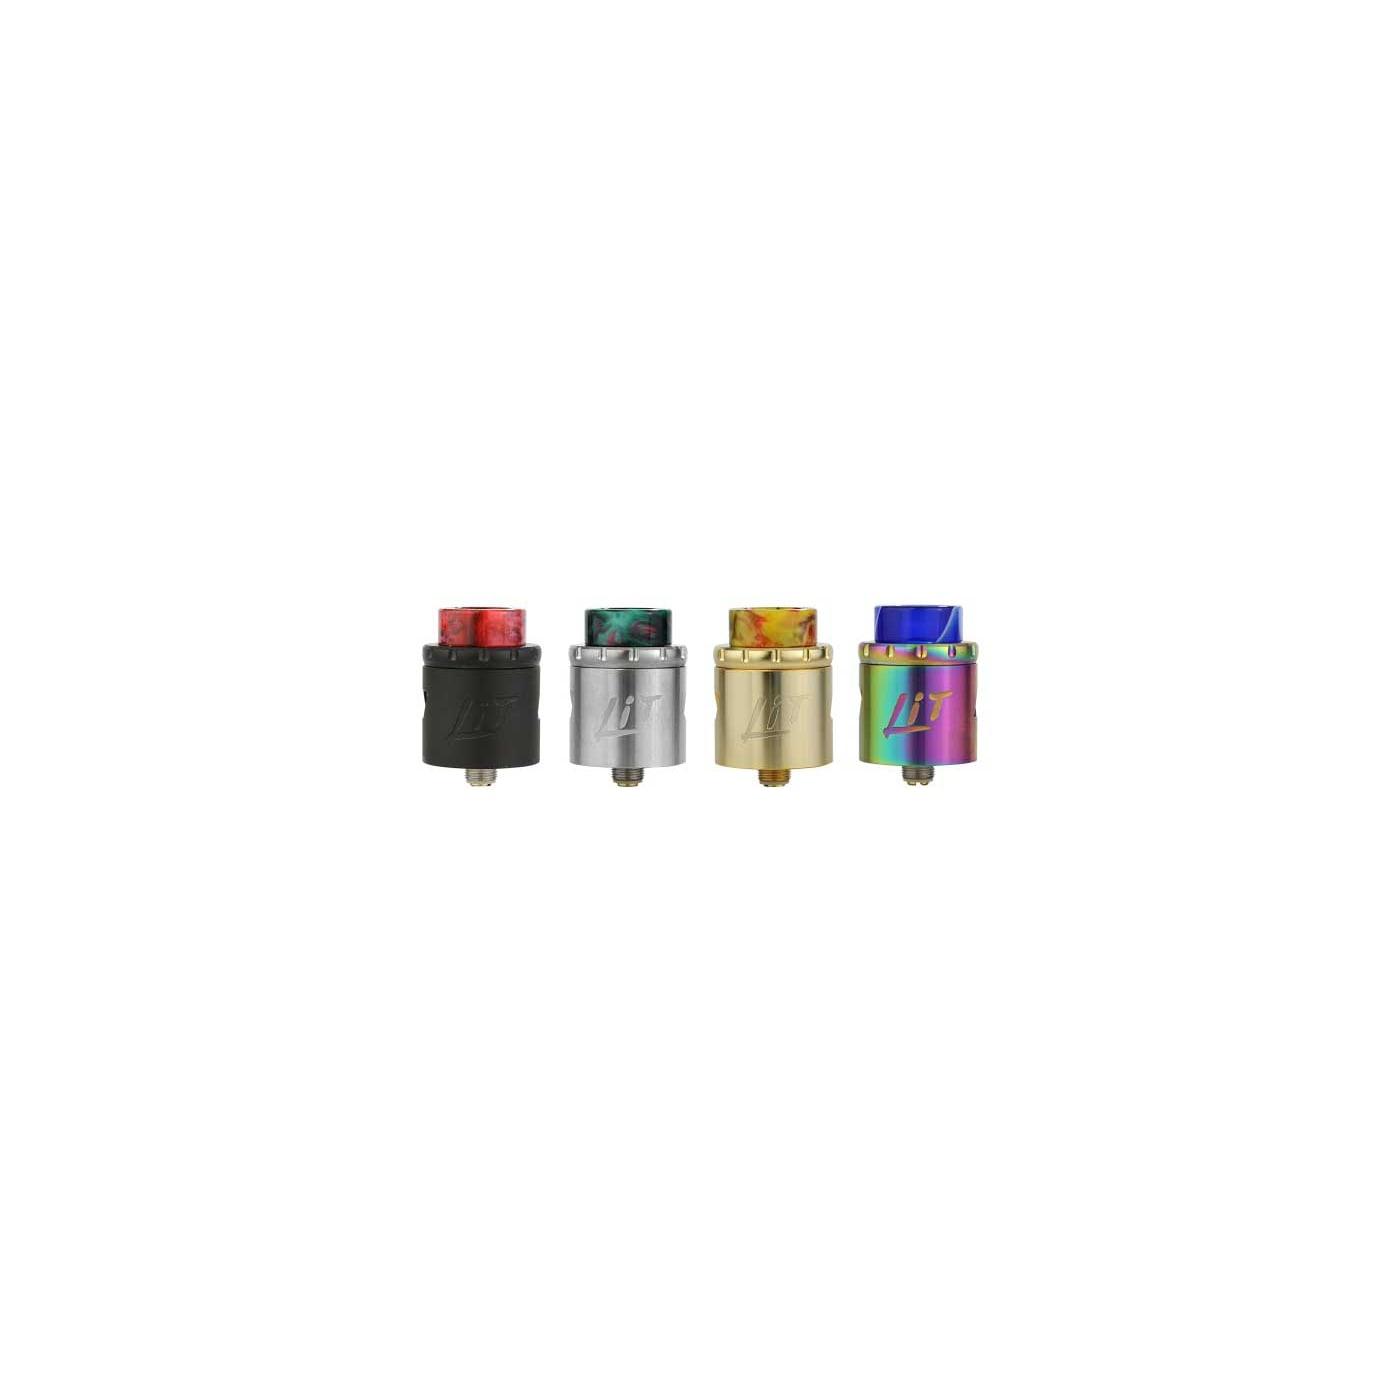 VandyVape Lit 24mm RDA - Rebuildable Atomizer